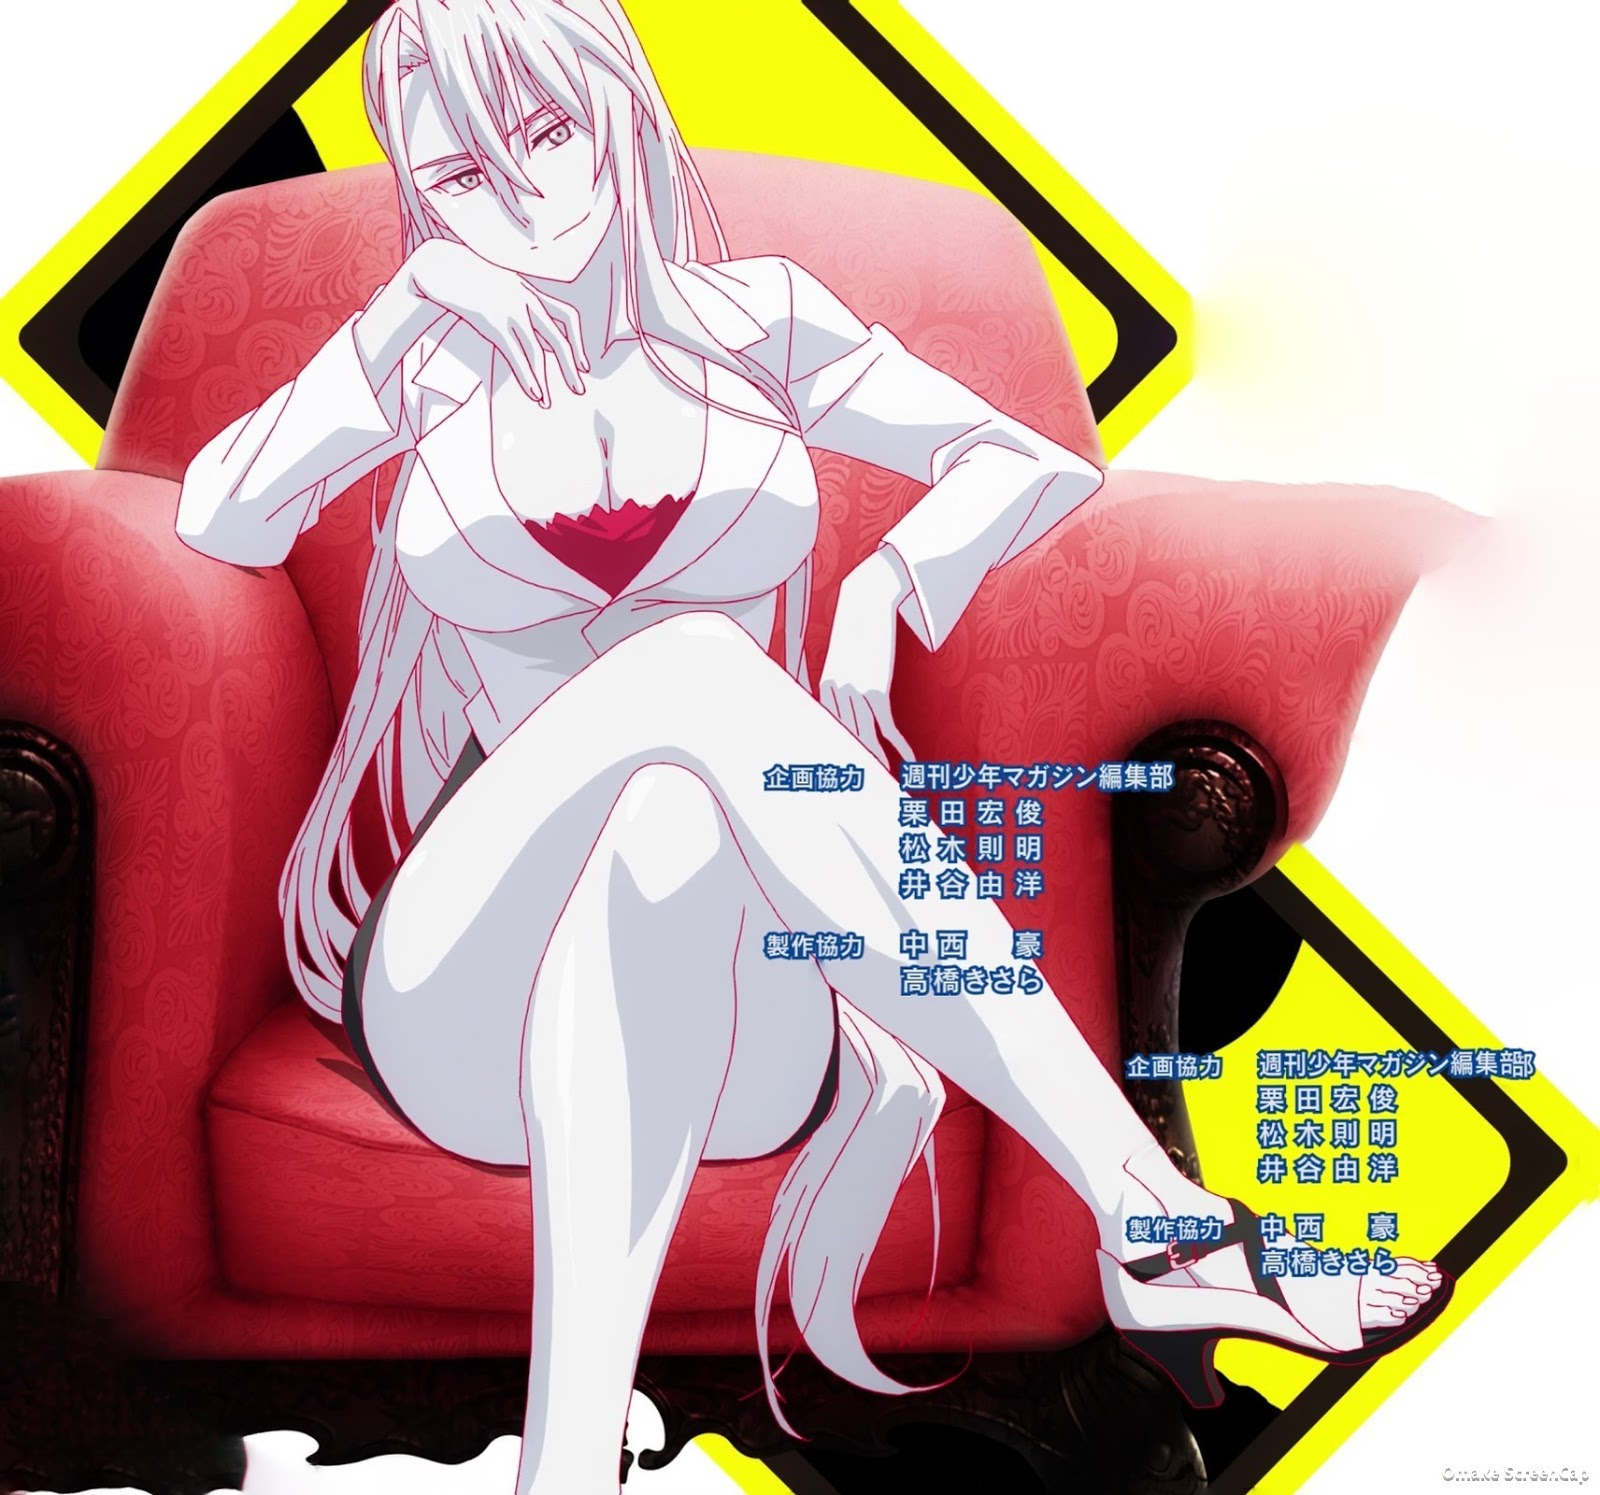 Joeschmos Gears and Grounds: 10 Second Anime - UQ Holder